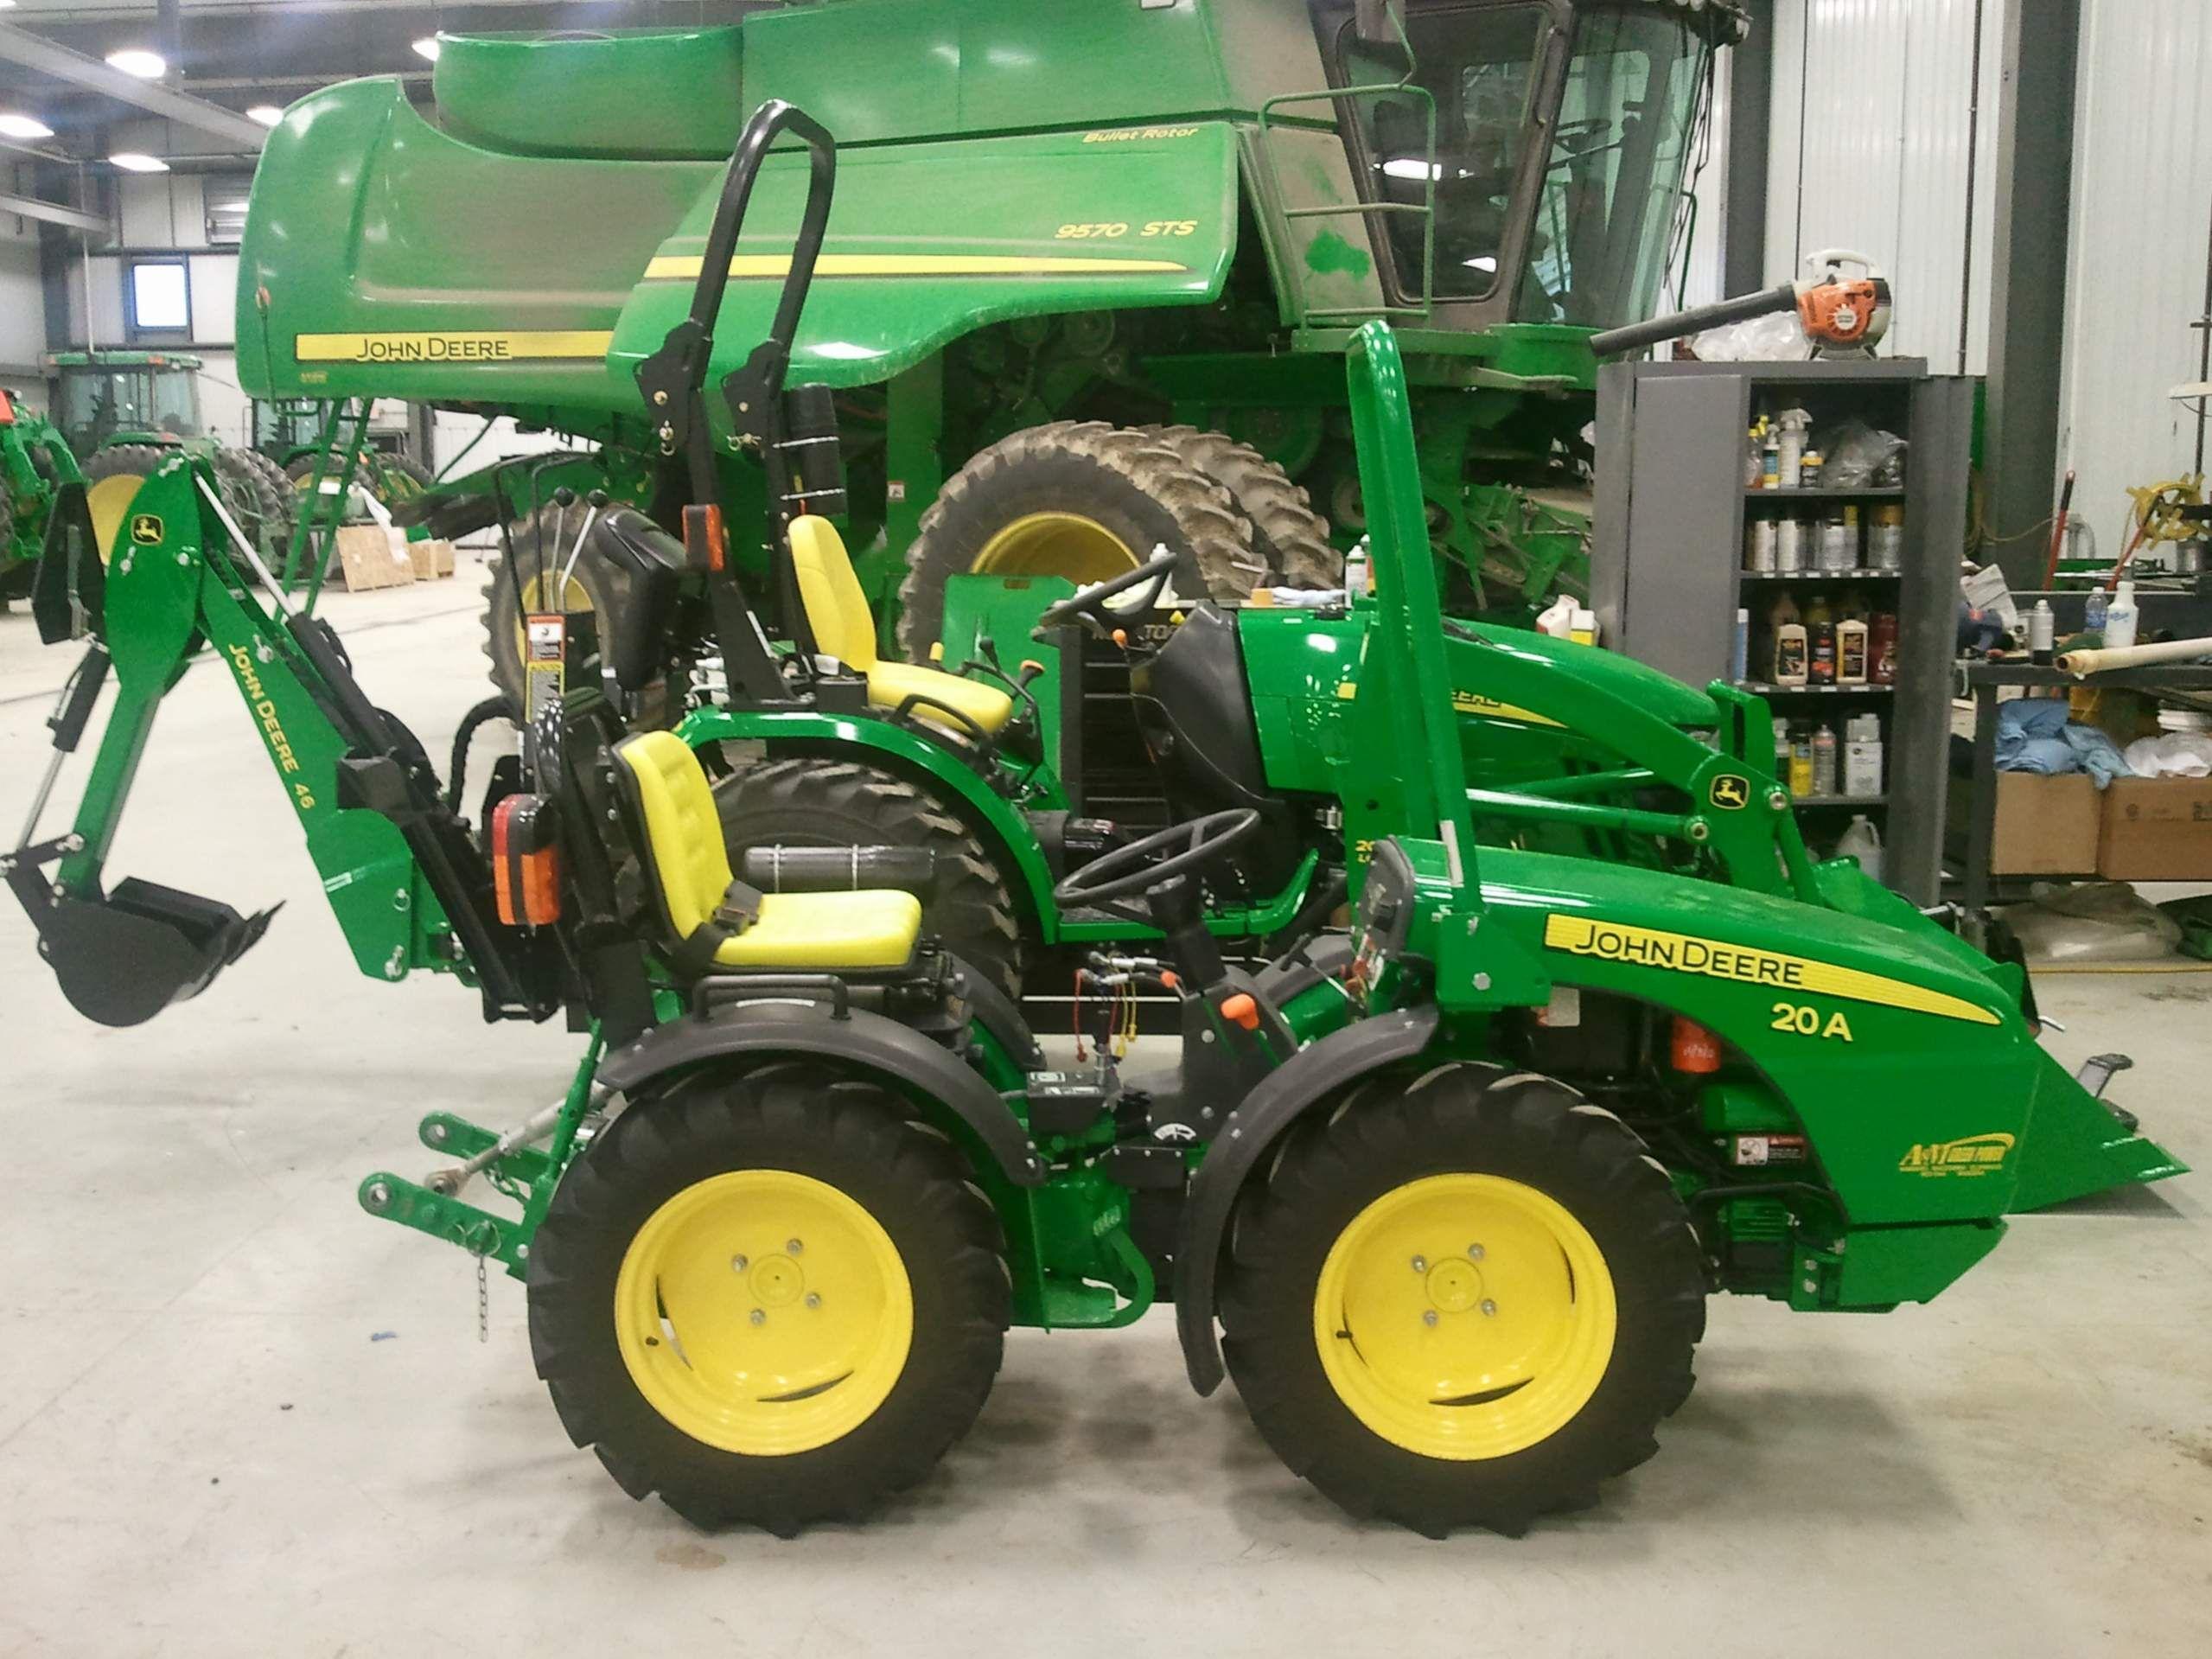 Pin On Tractors Made In Italy destiné Image Tracteur John Deere